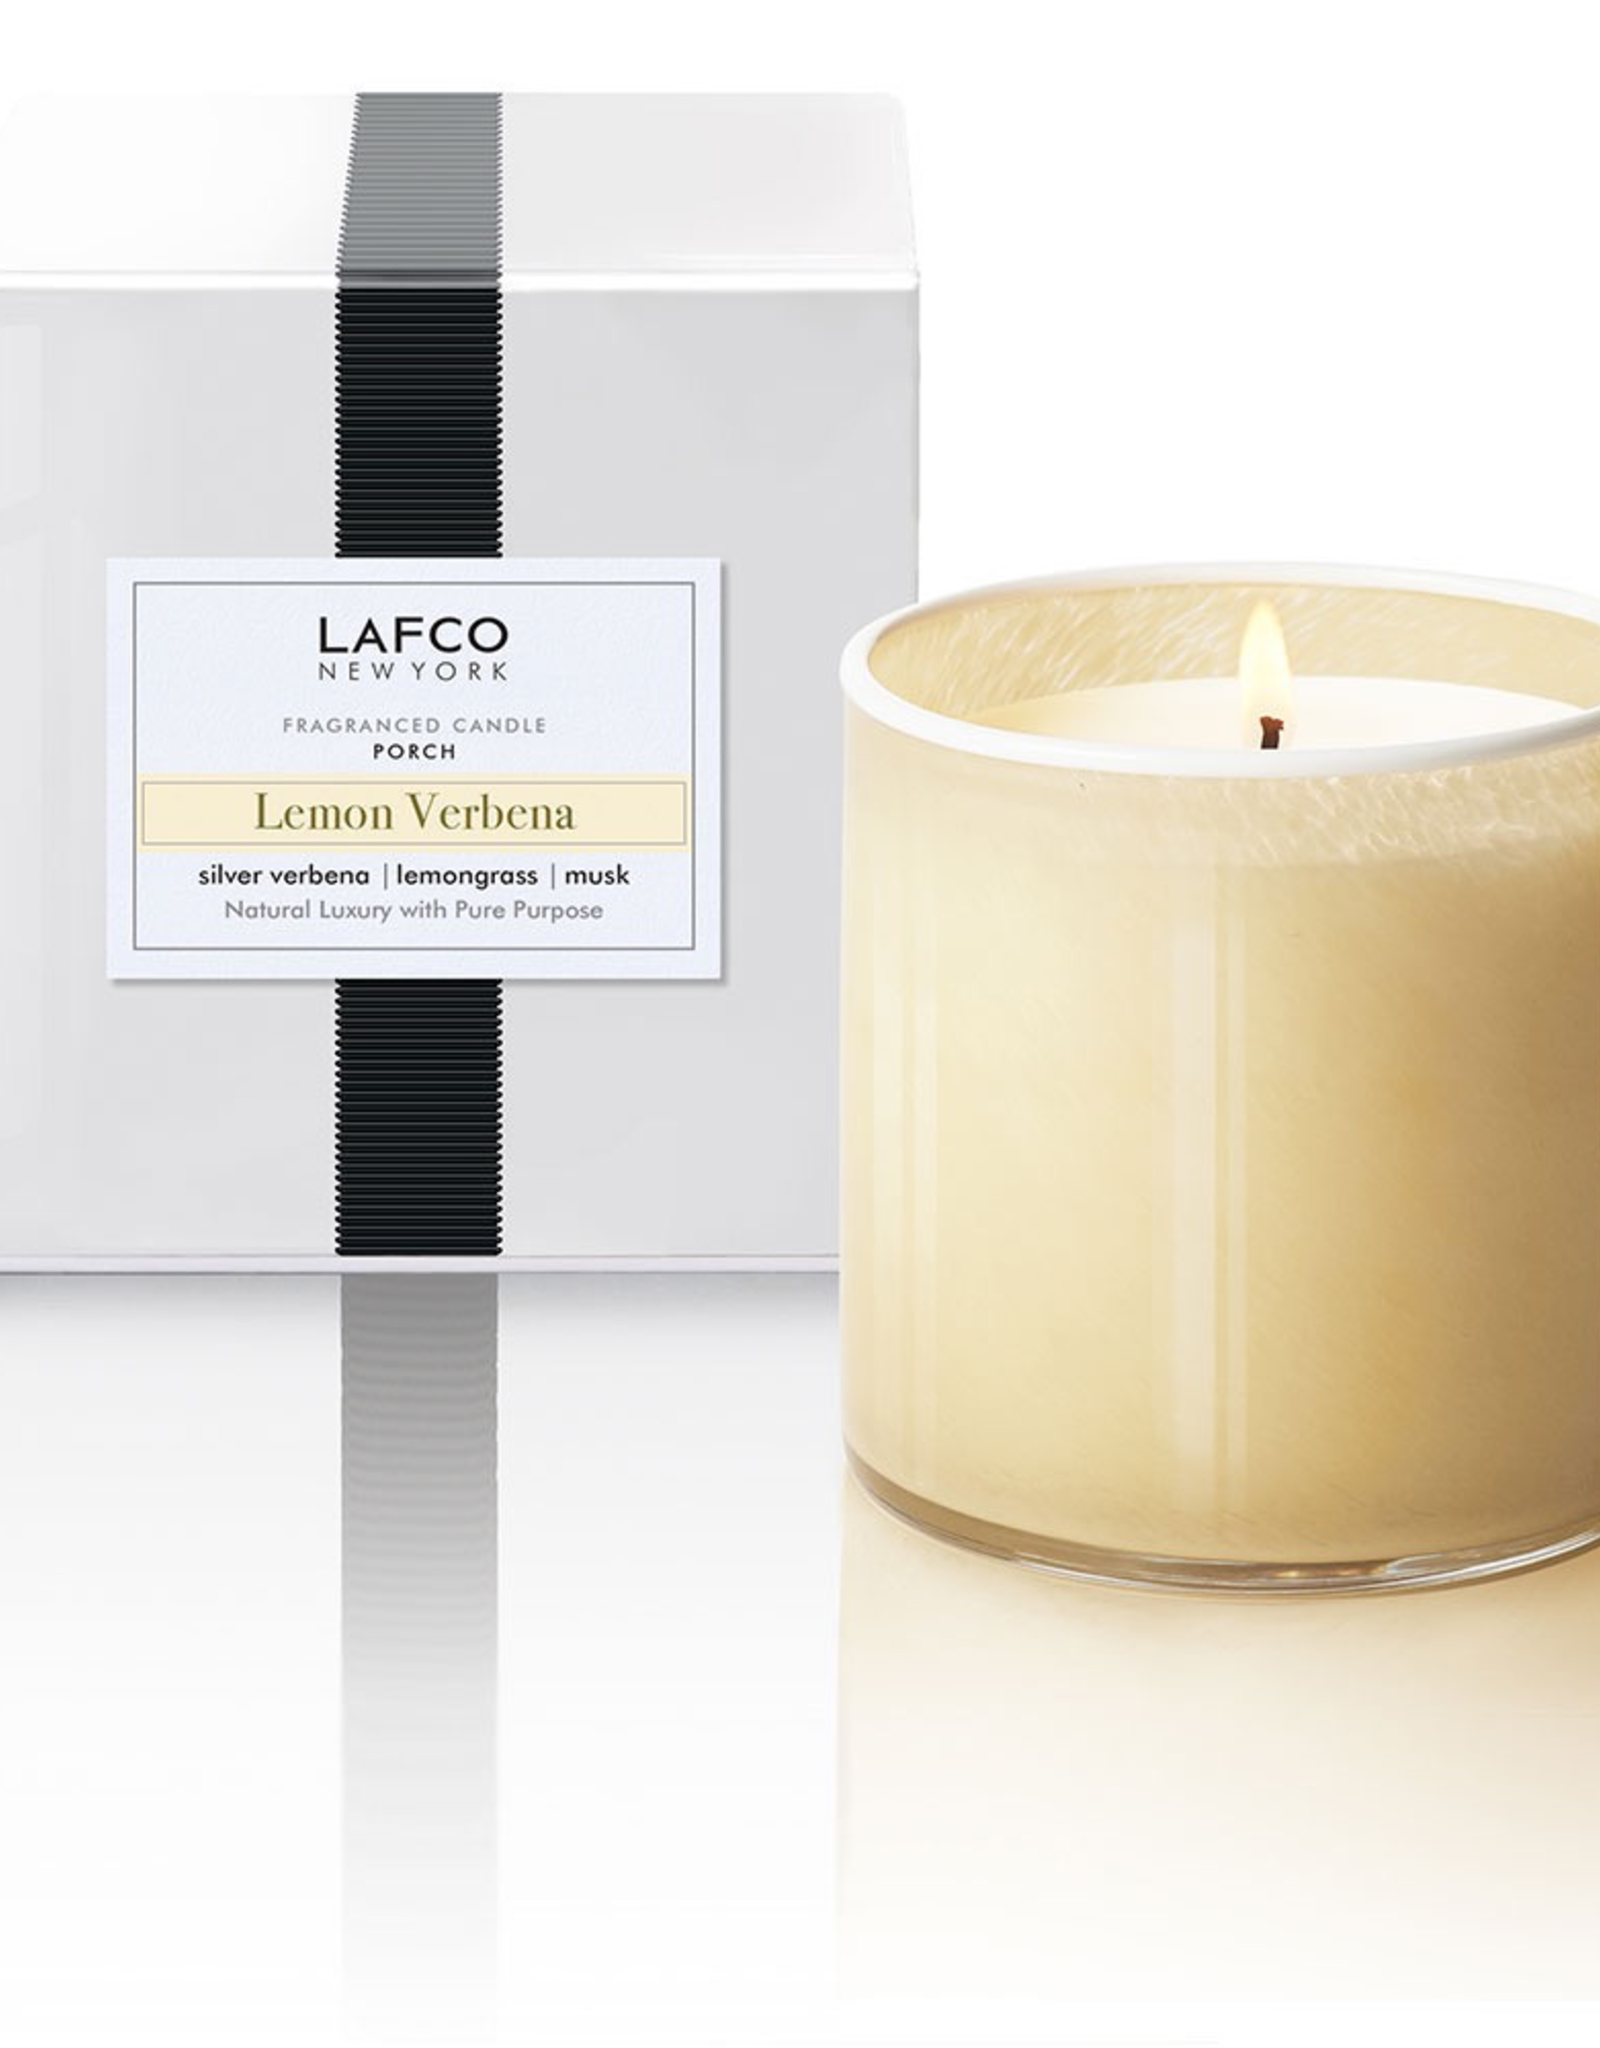 Candle Lafco, Lemon Verbena, Porch